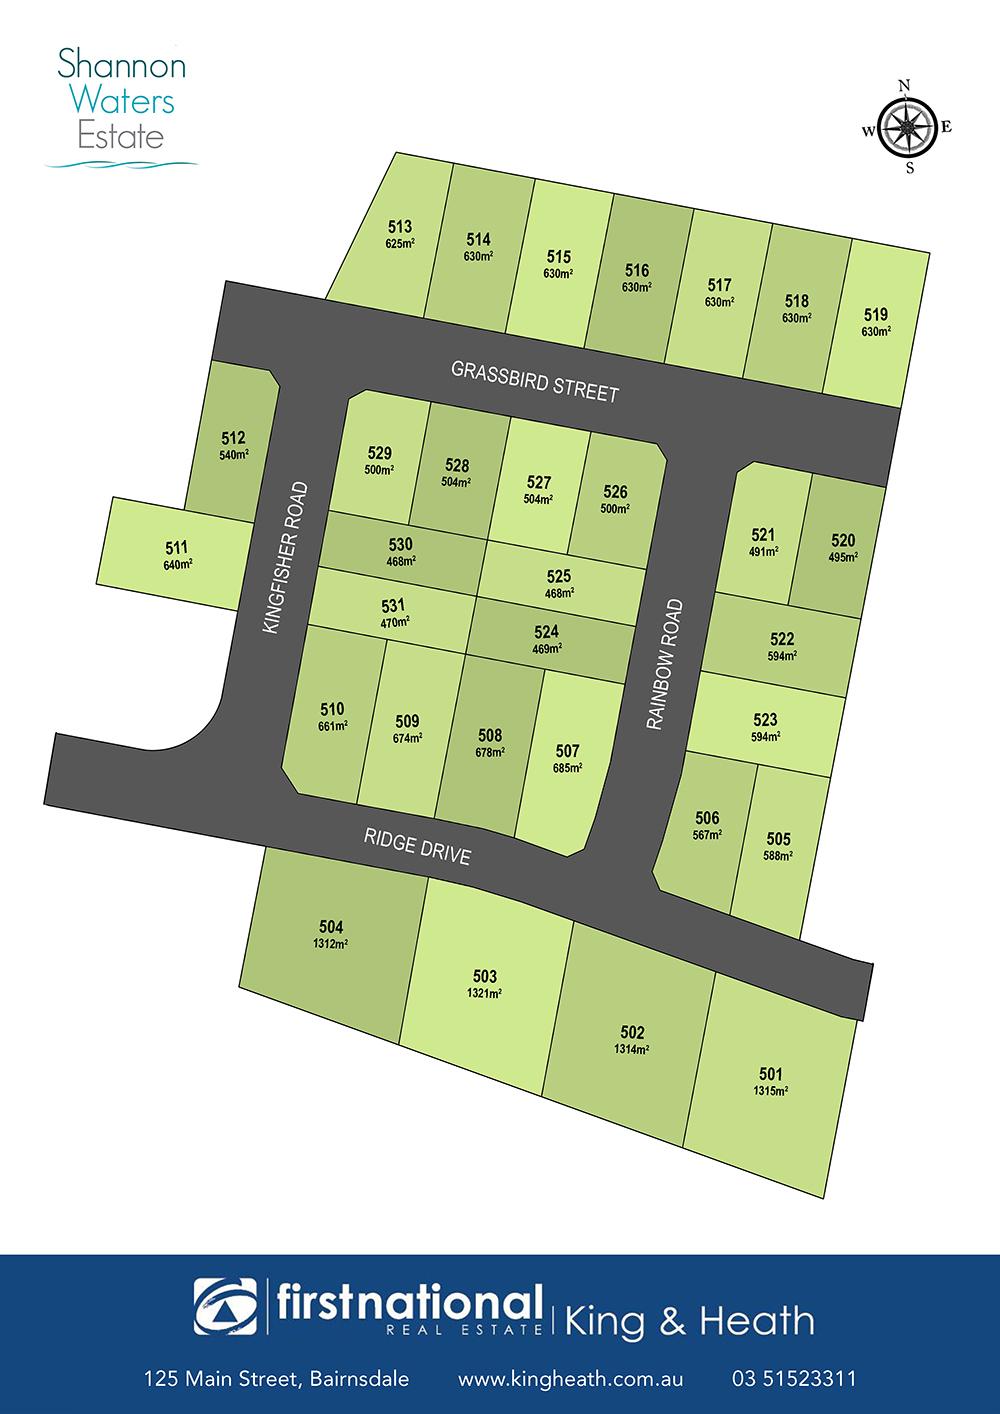 Lot 501 Ridge Drive, Bairnsdale VIC 3875-1